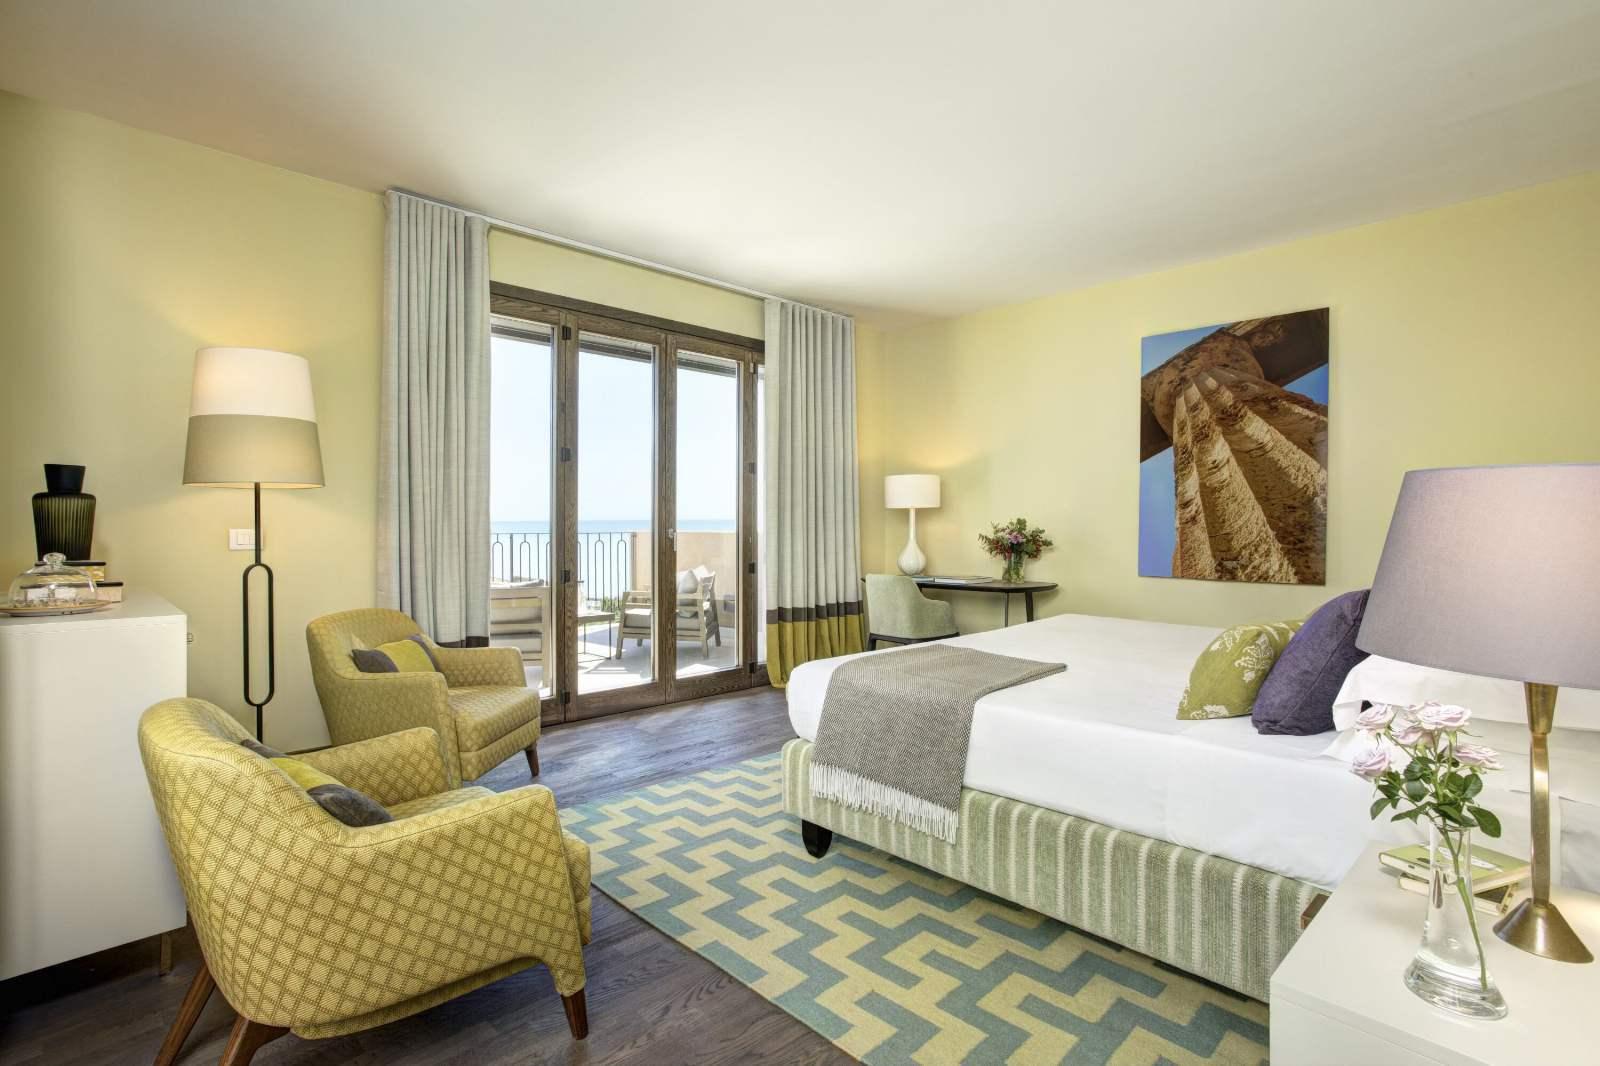 Verdura Resort: Private Villas: room / property / locale photo. Image 7